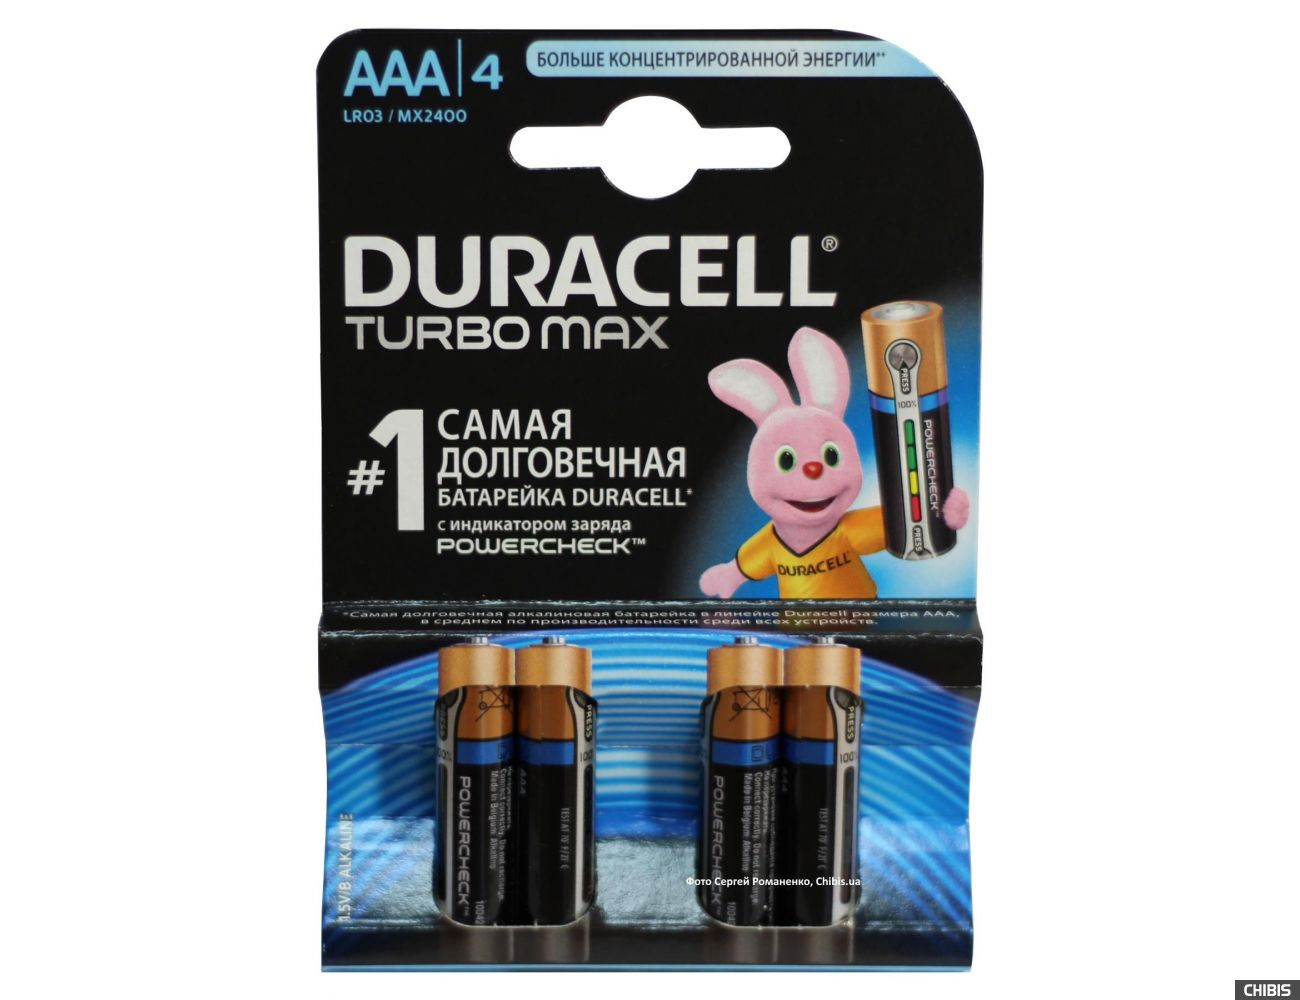 Батарейка ААА Duracell Turbo Max (LR03, 1.5V, Alkaline Щелочная) 1/4 шт. 5000394069220